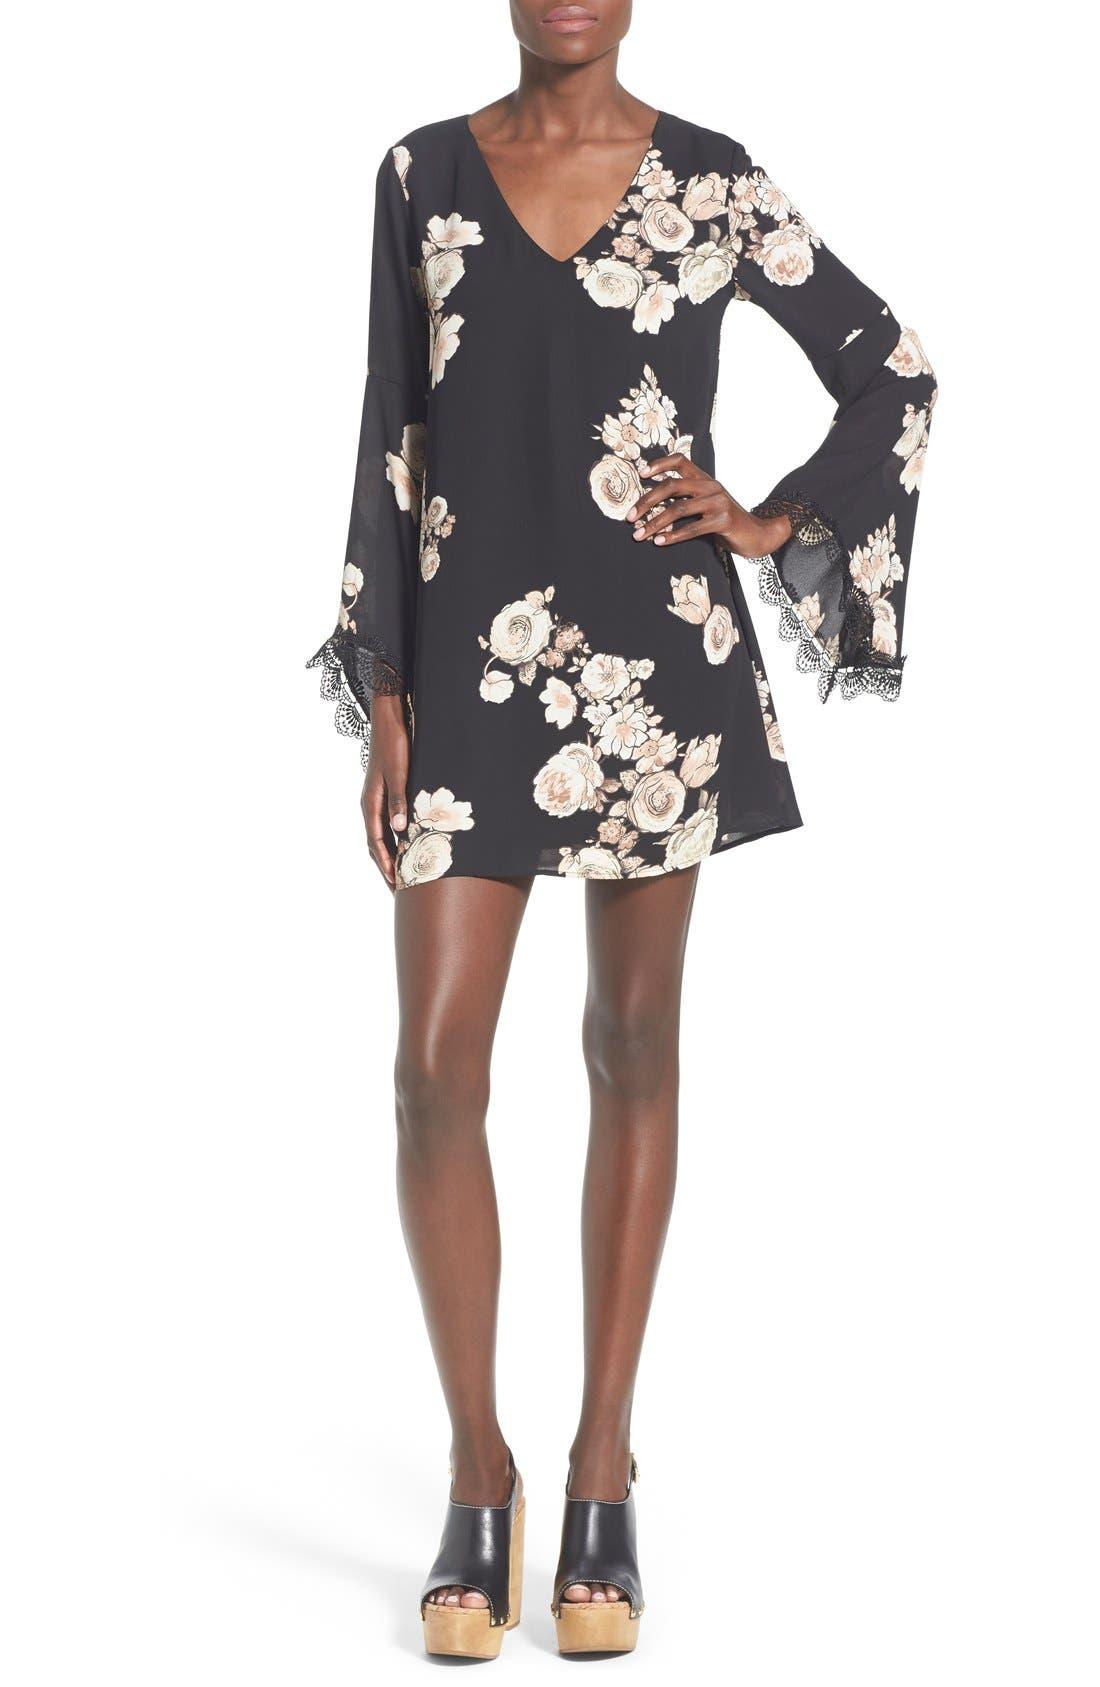 Alternate Image 1 Selected - ASTR Lace Trim Shift Dress